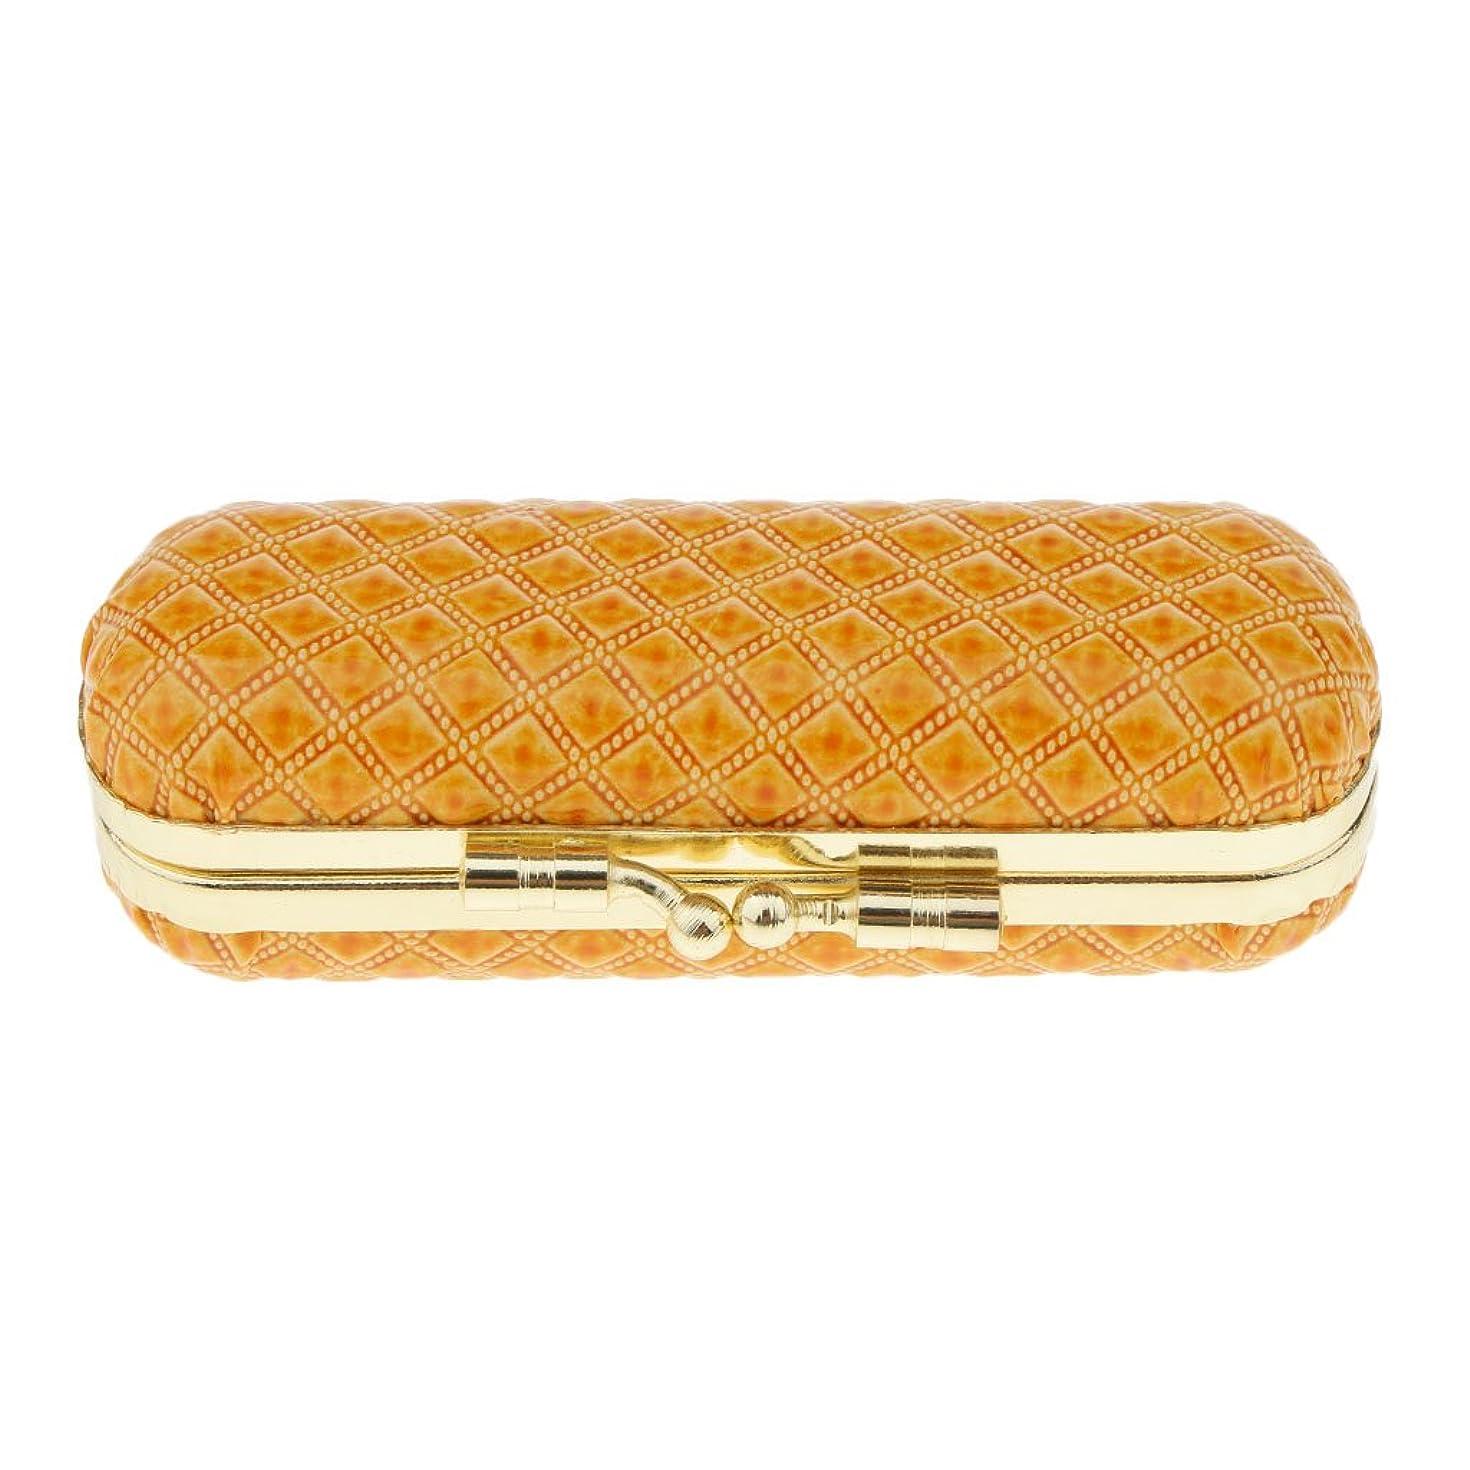 Baosity 化粧ポーチ 口紅ホルダー リップスティック リップグロス 収納ケース ミラー付き 可愛い 小物収納 携帯用 6タイプ - オレンジ